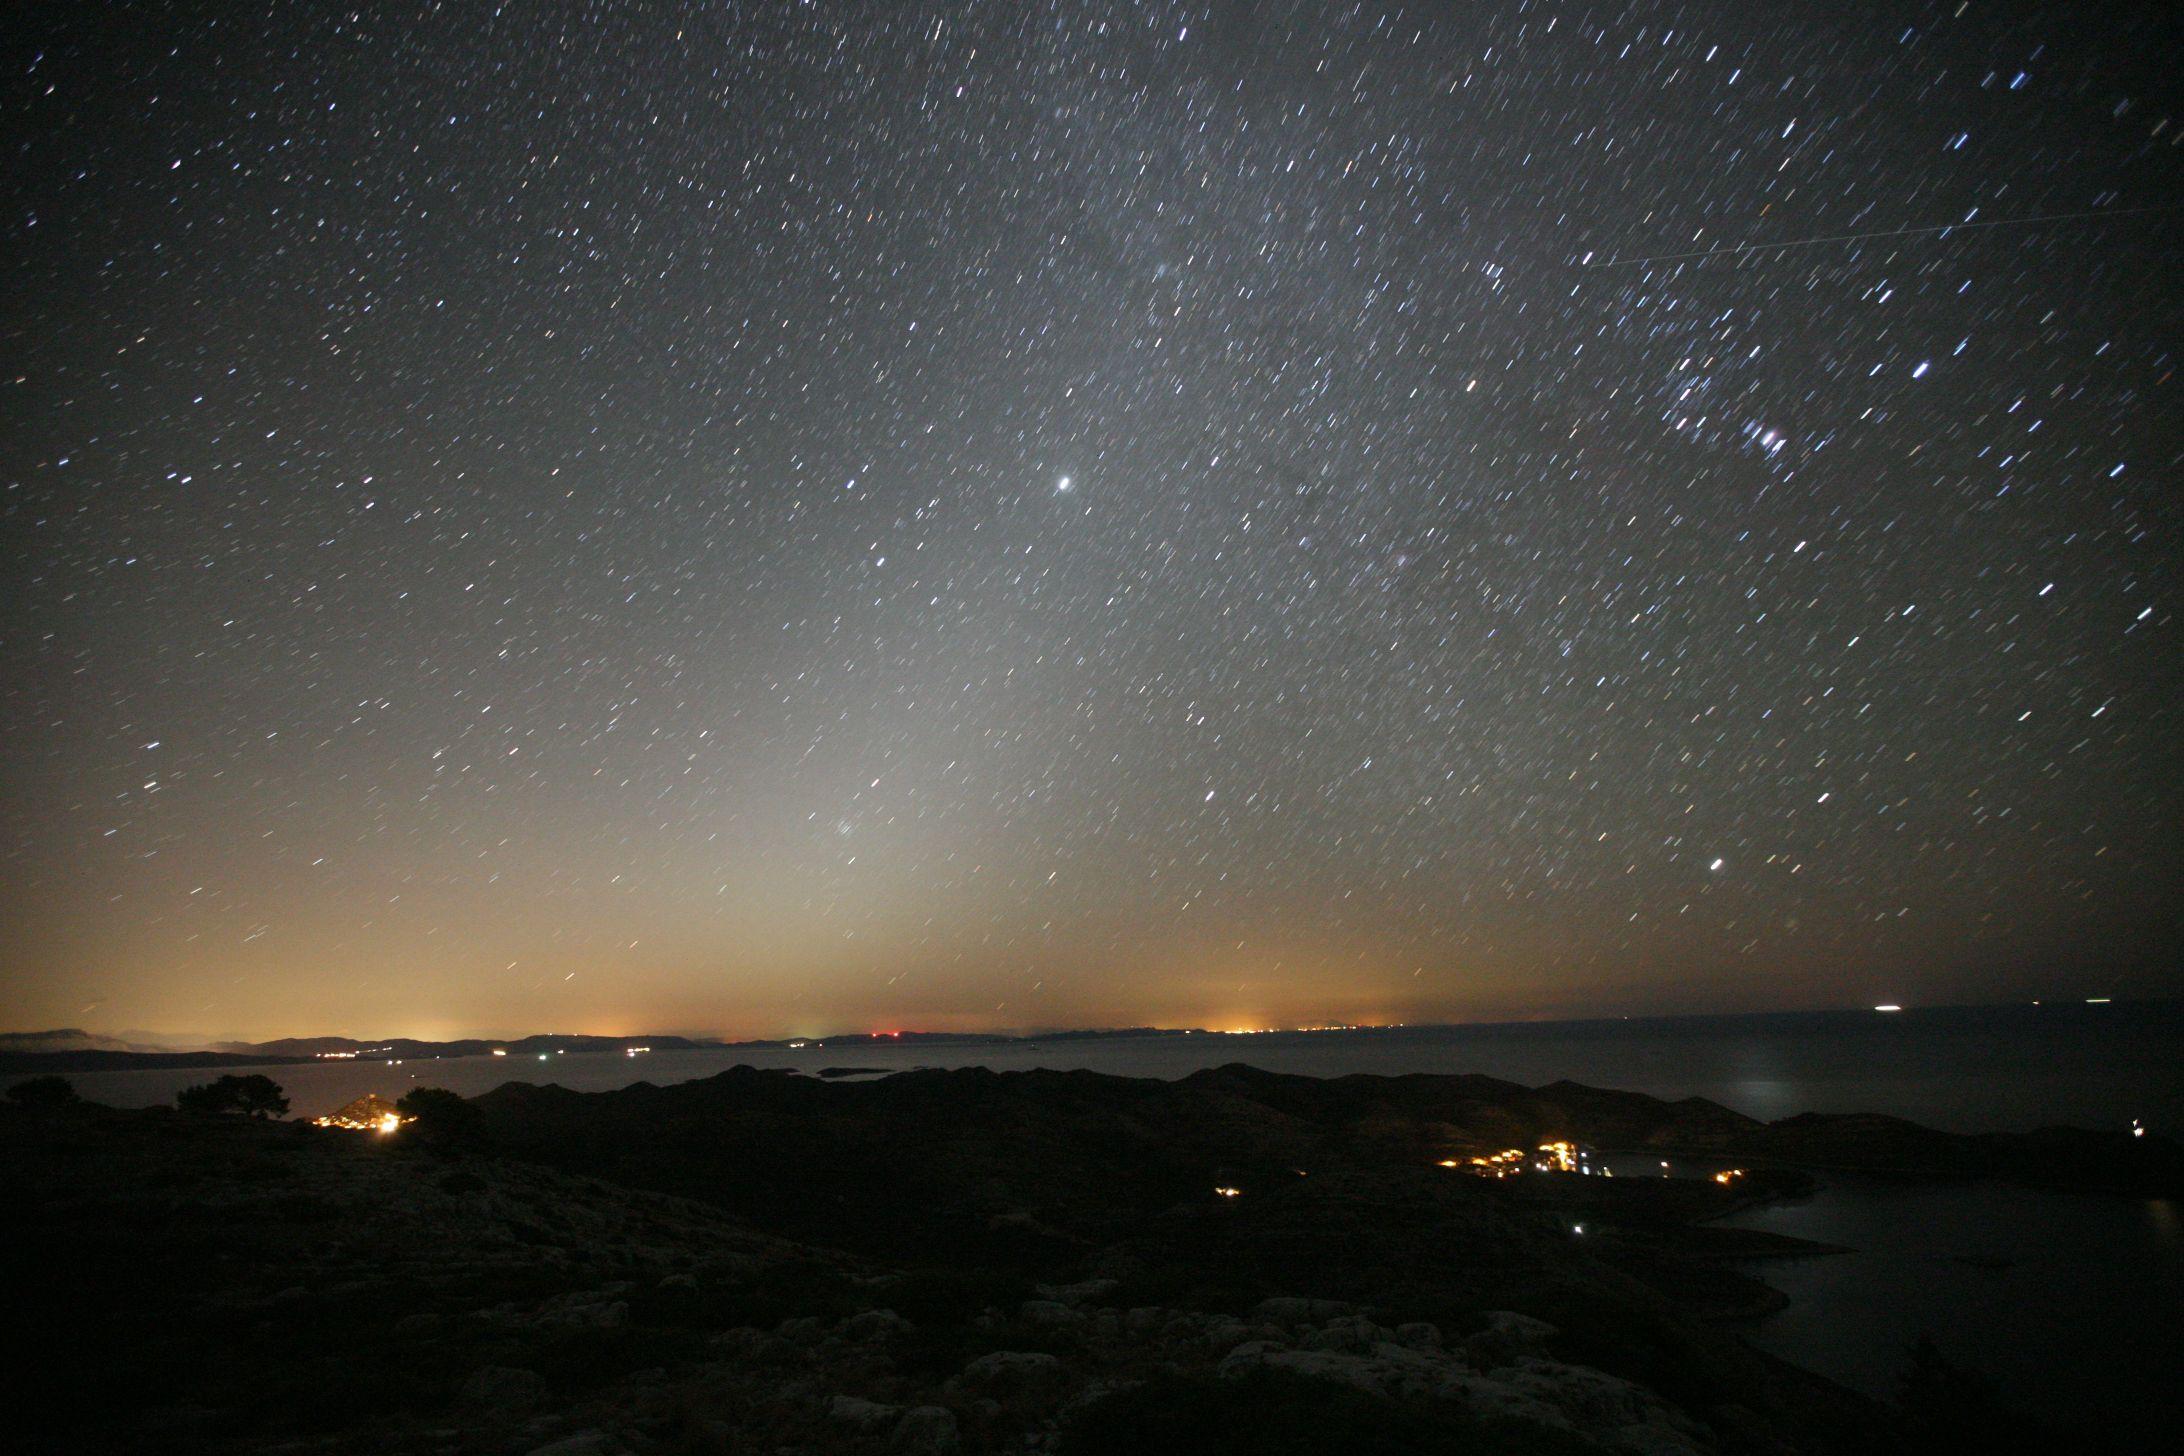 Lastovo, Croatia - zodiacal light MR